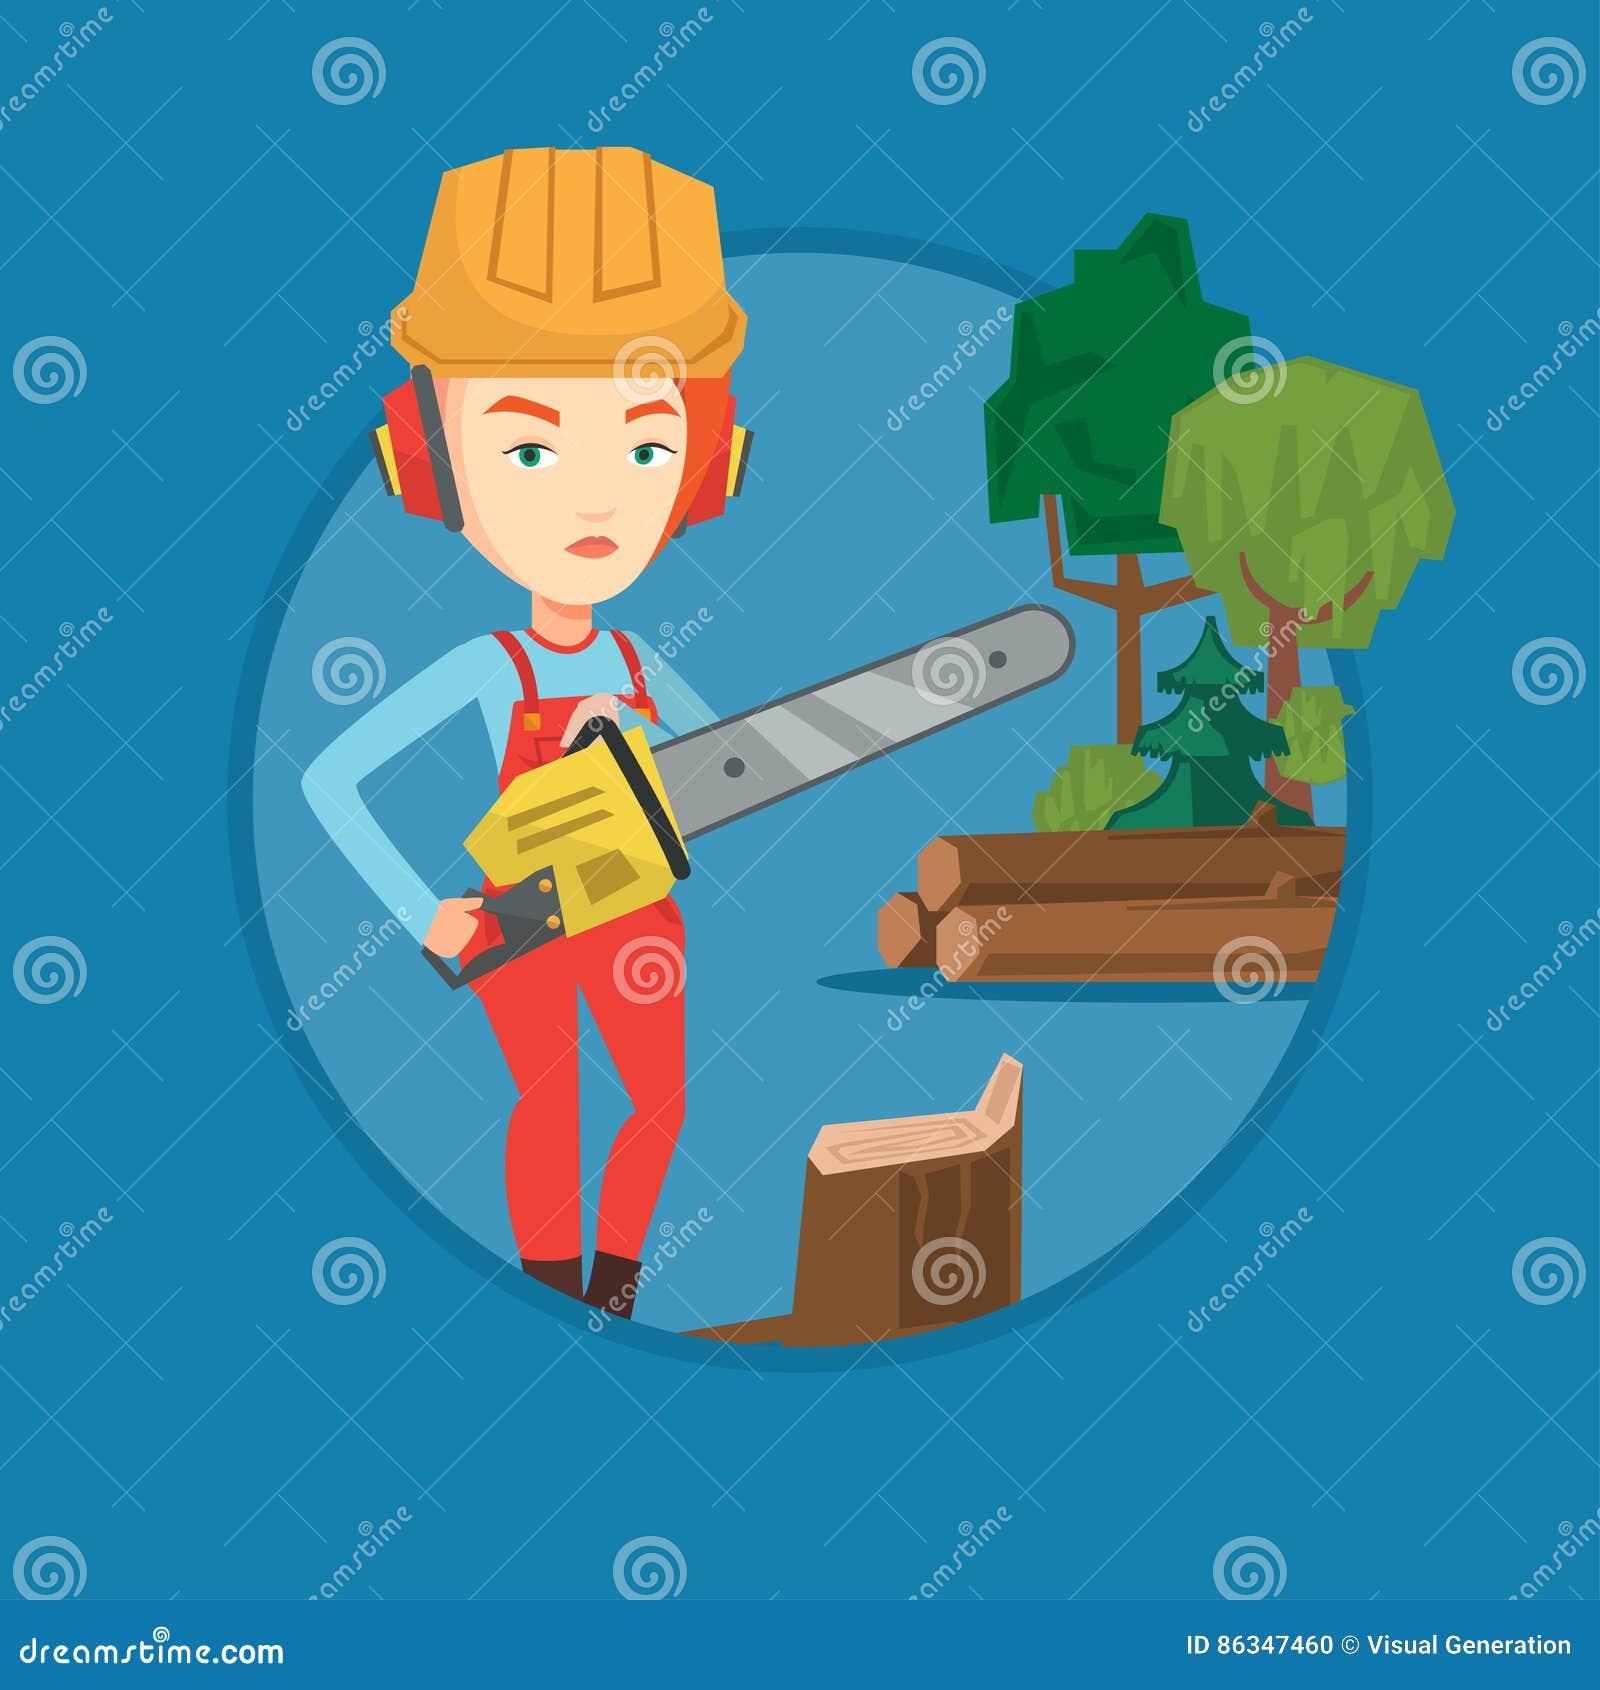 Lumberjack clipart female, Lumberjack female Transparent FREE for download  on WebStockReview 2020